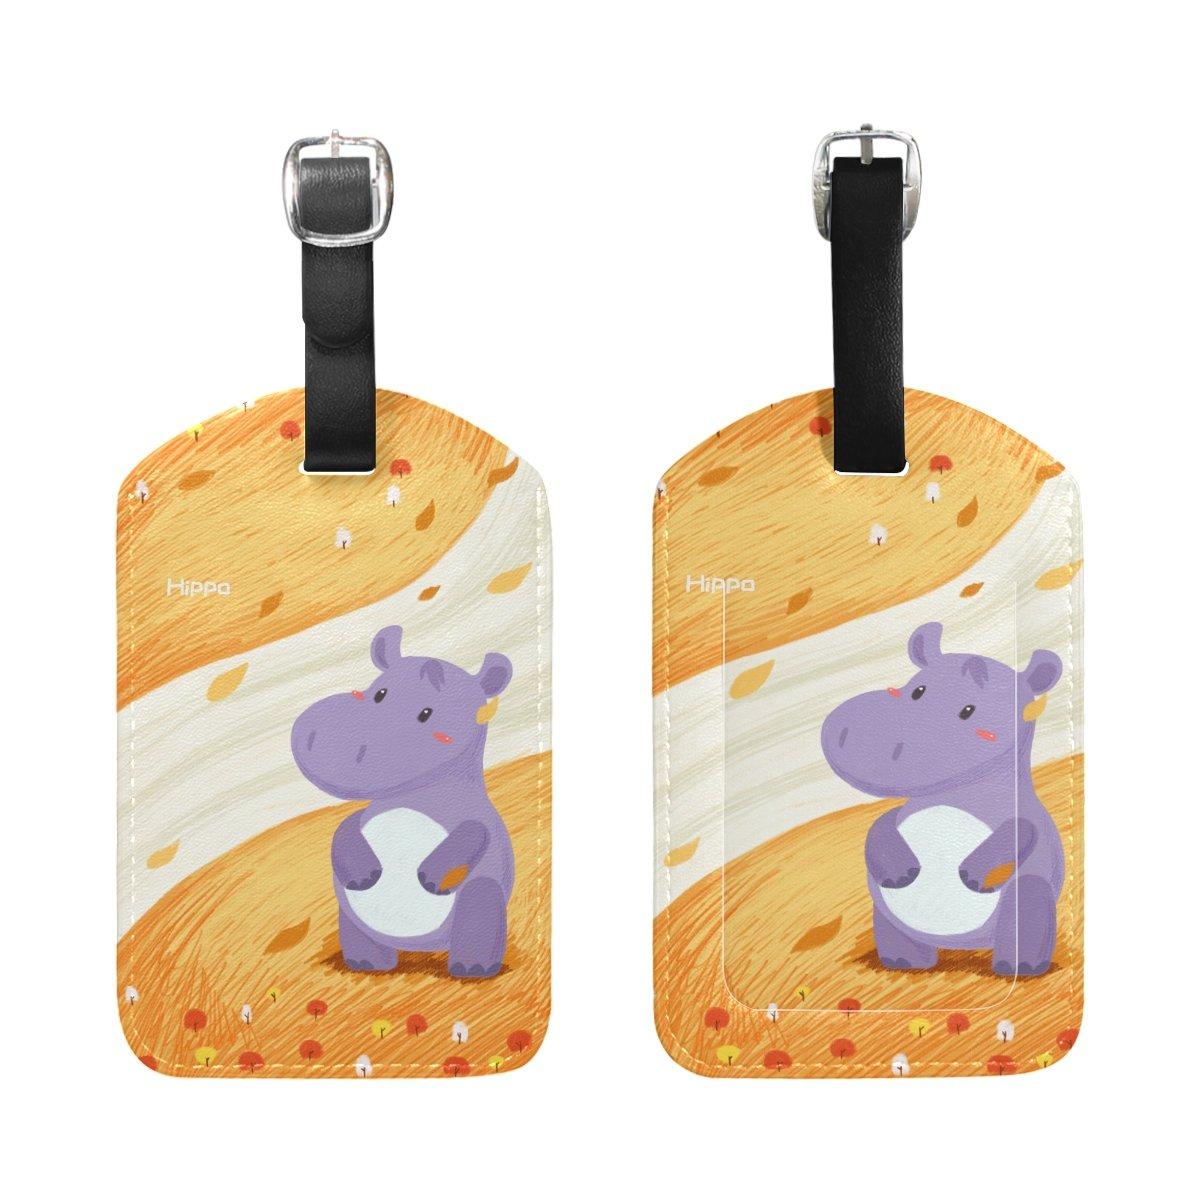 Saobao Travel Luggage Tag Hippo PU Leather Baggage Suitcase Travel ID Bag Tag 1Pcs